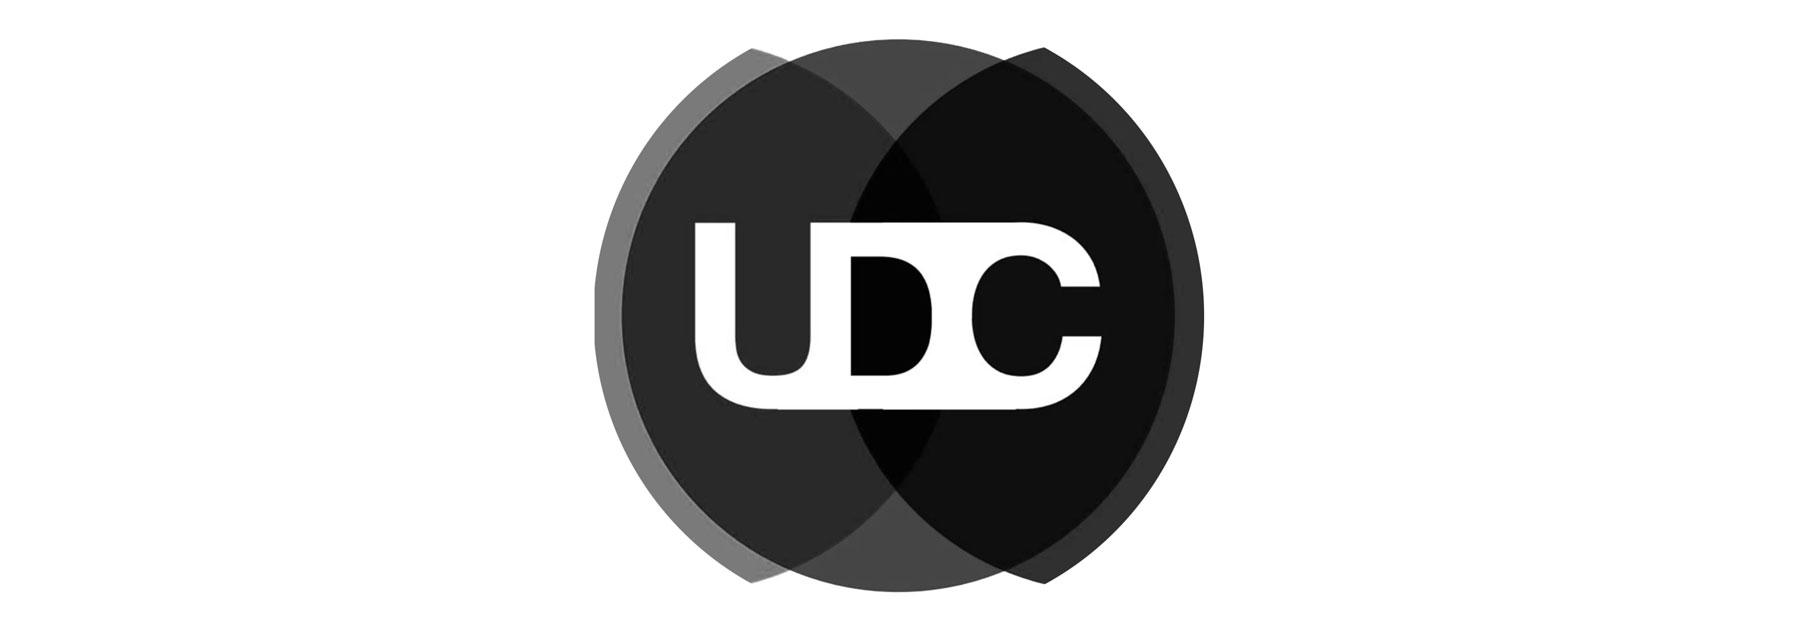 UDC_SMALL2.jpg